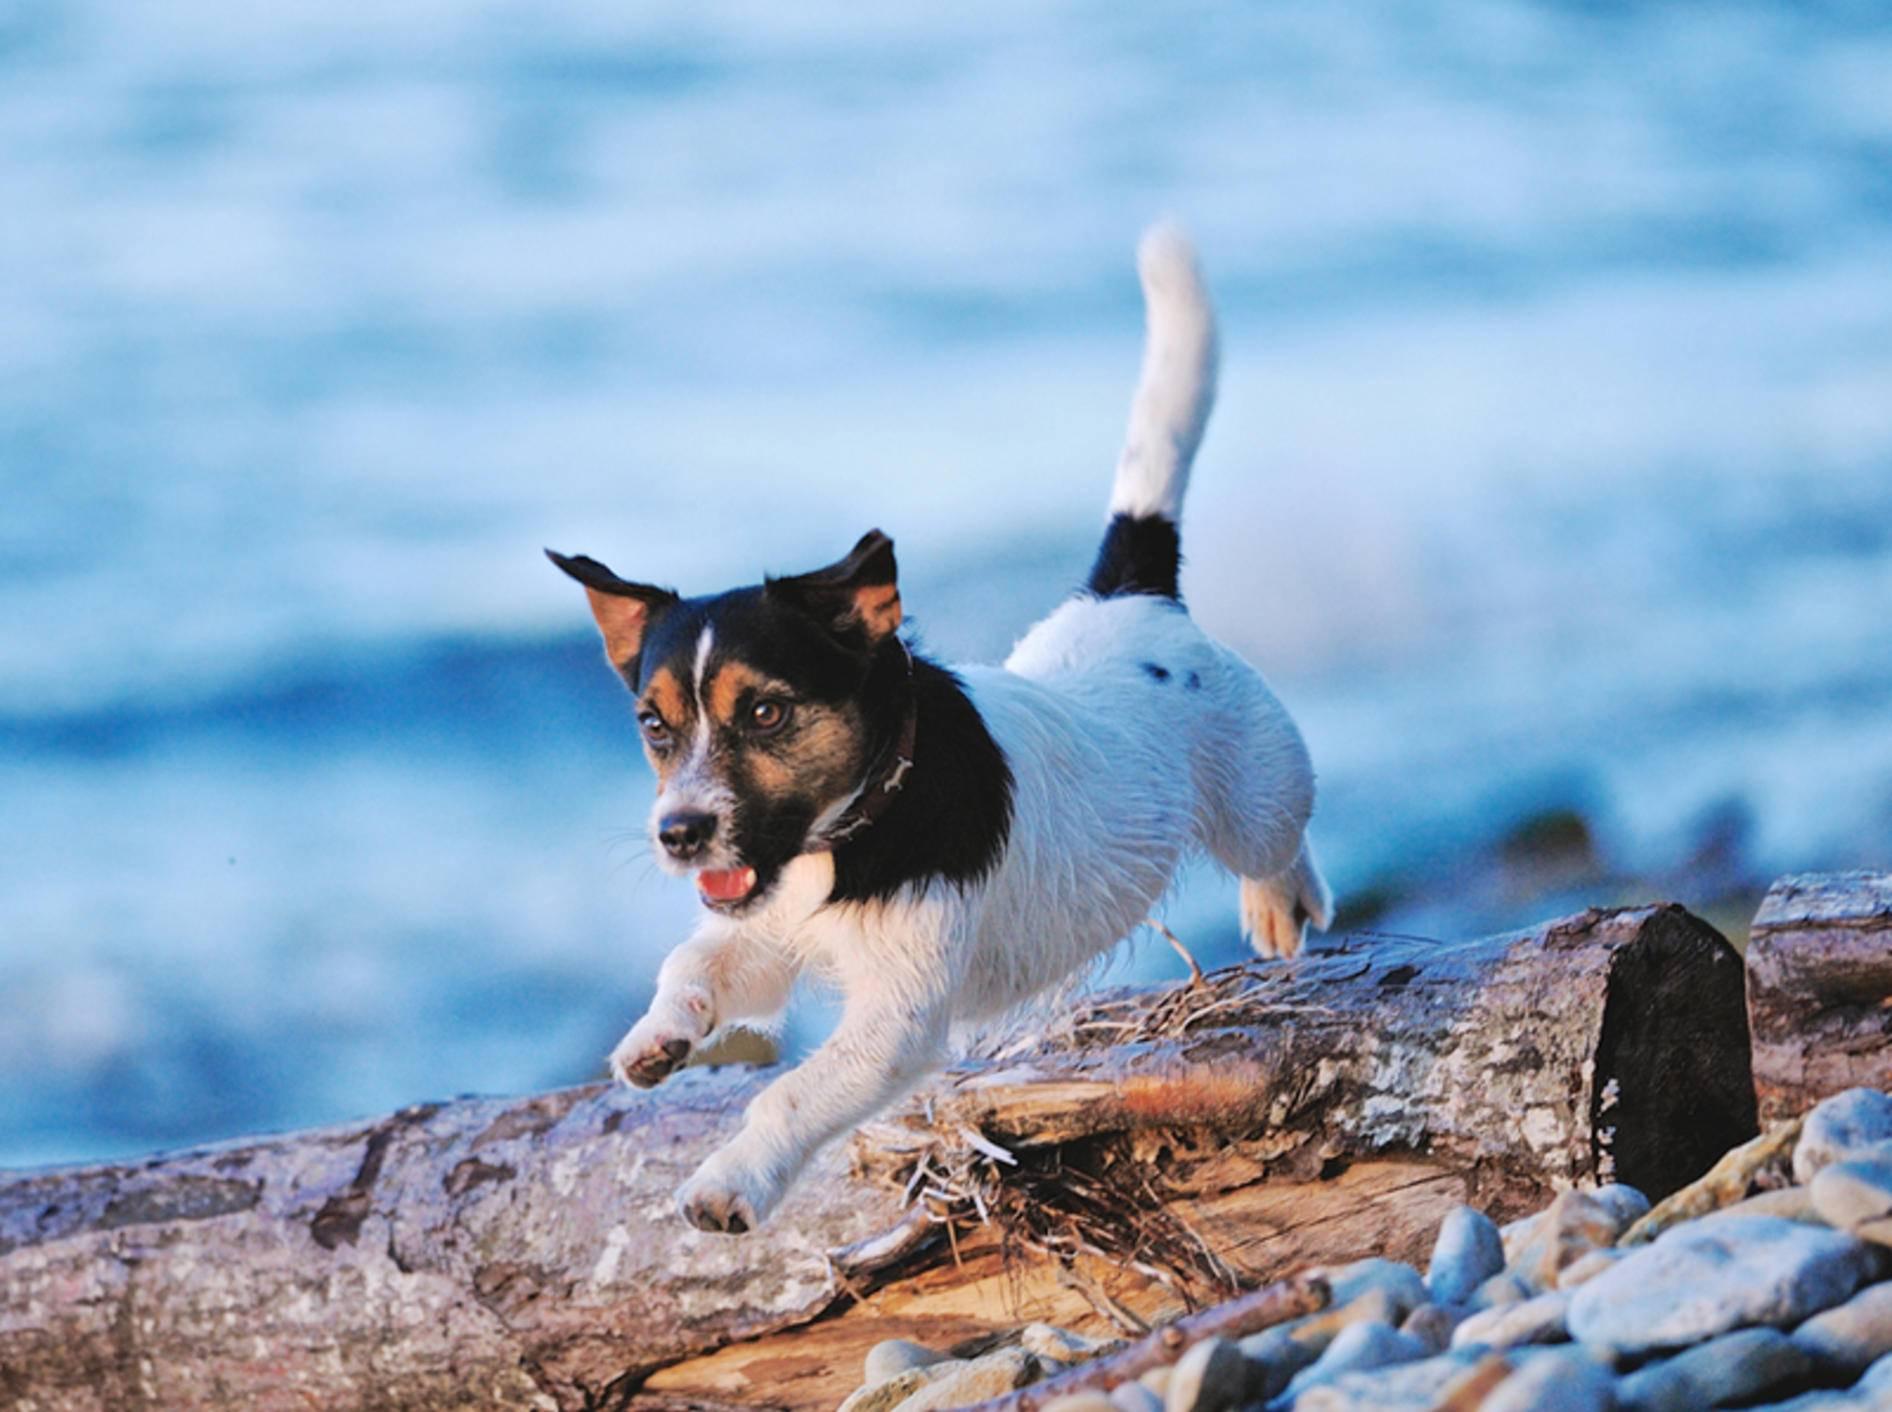 Jack Russell Terrier namens Kira: Der Name landete 2012 auf Platz 5